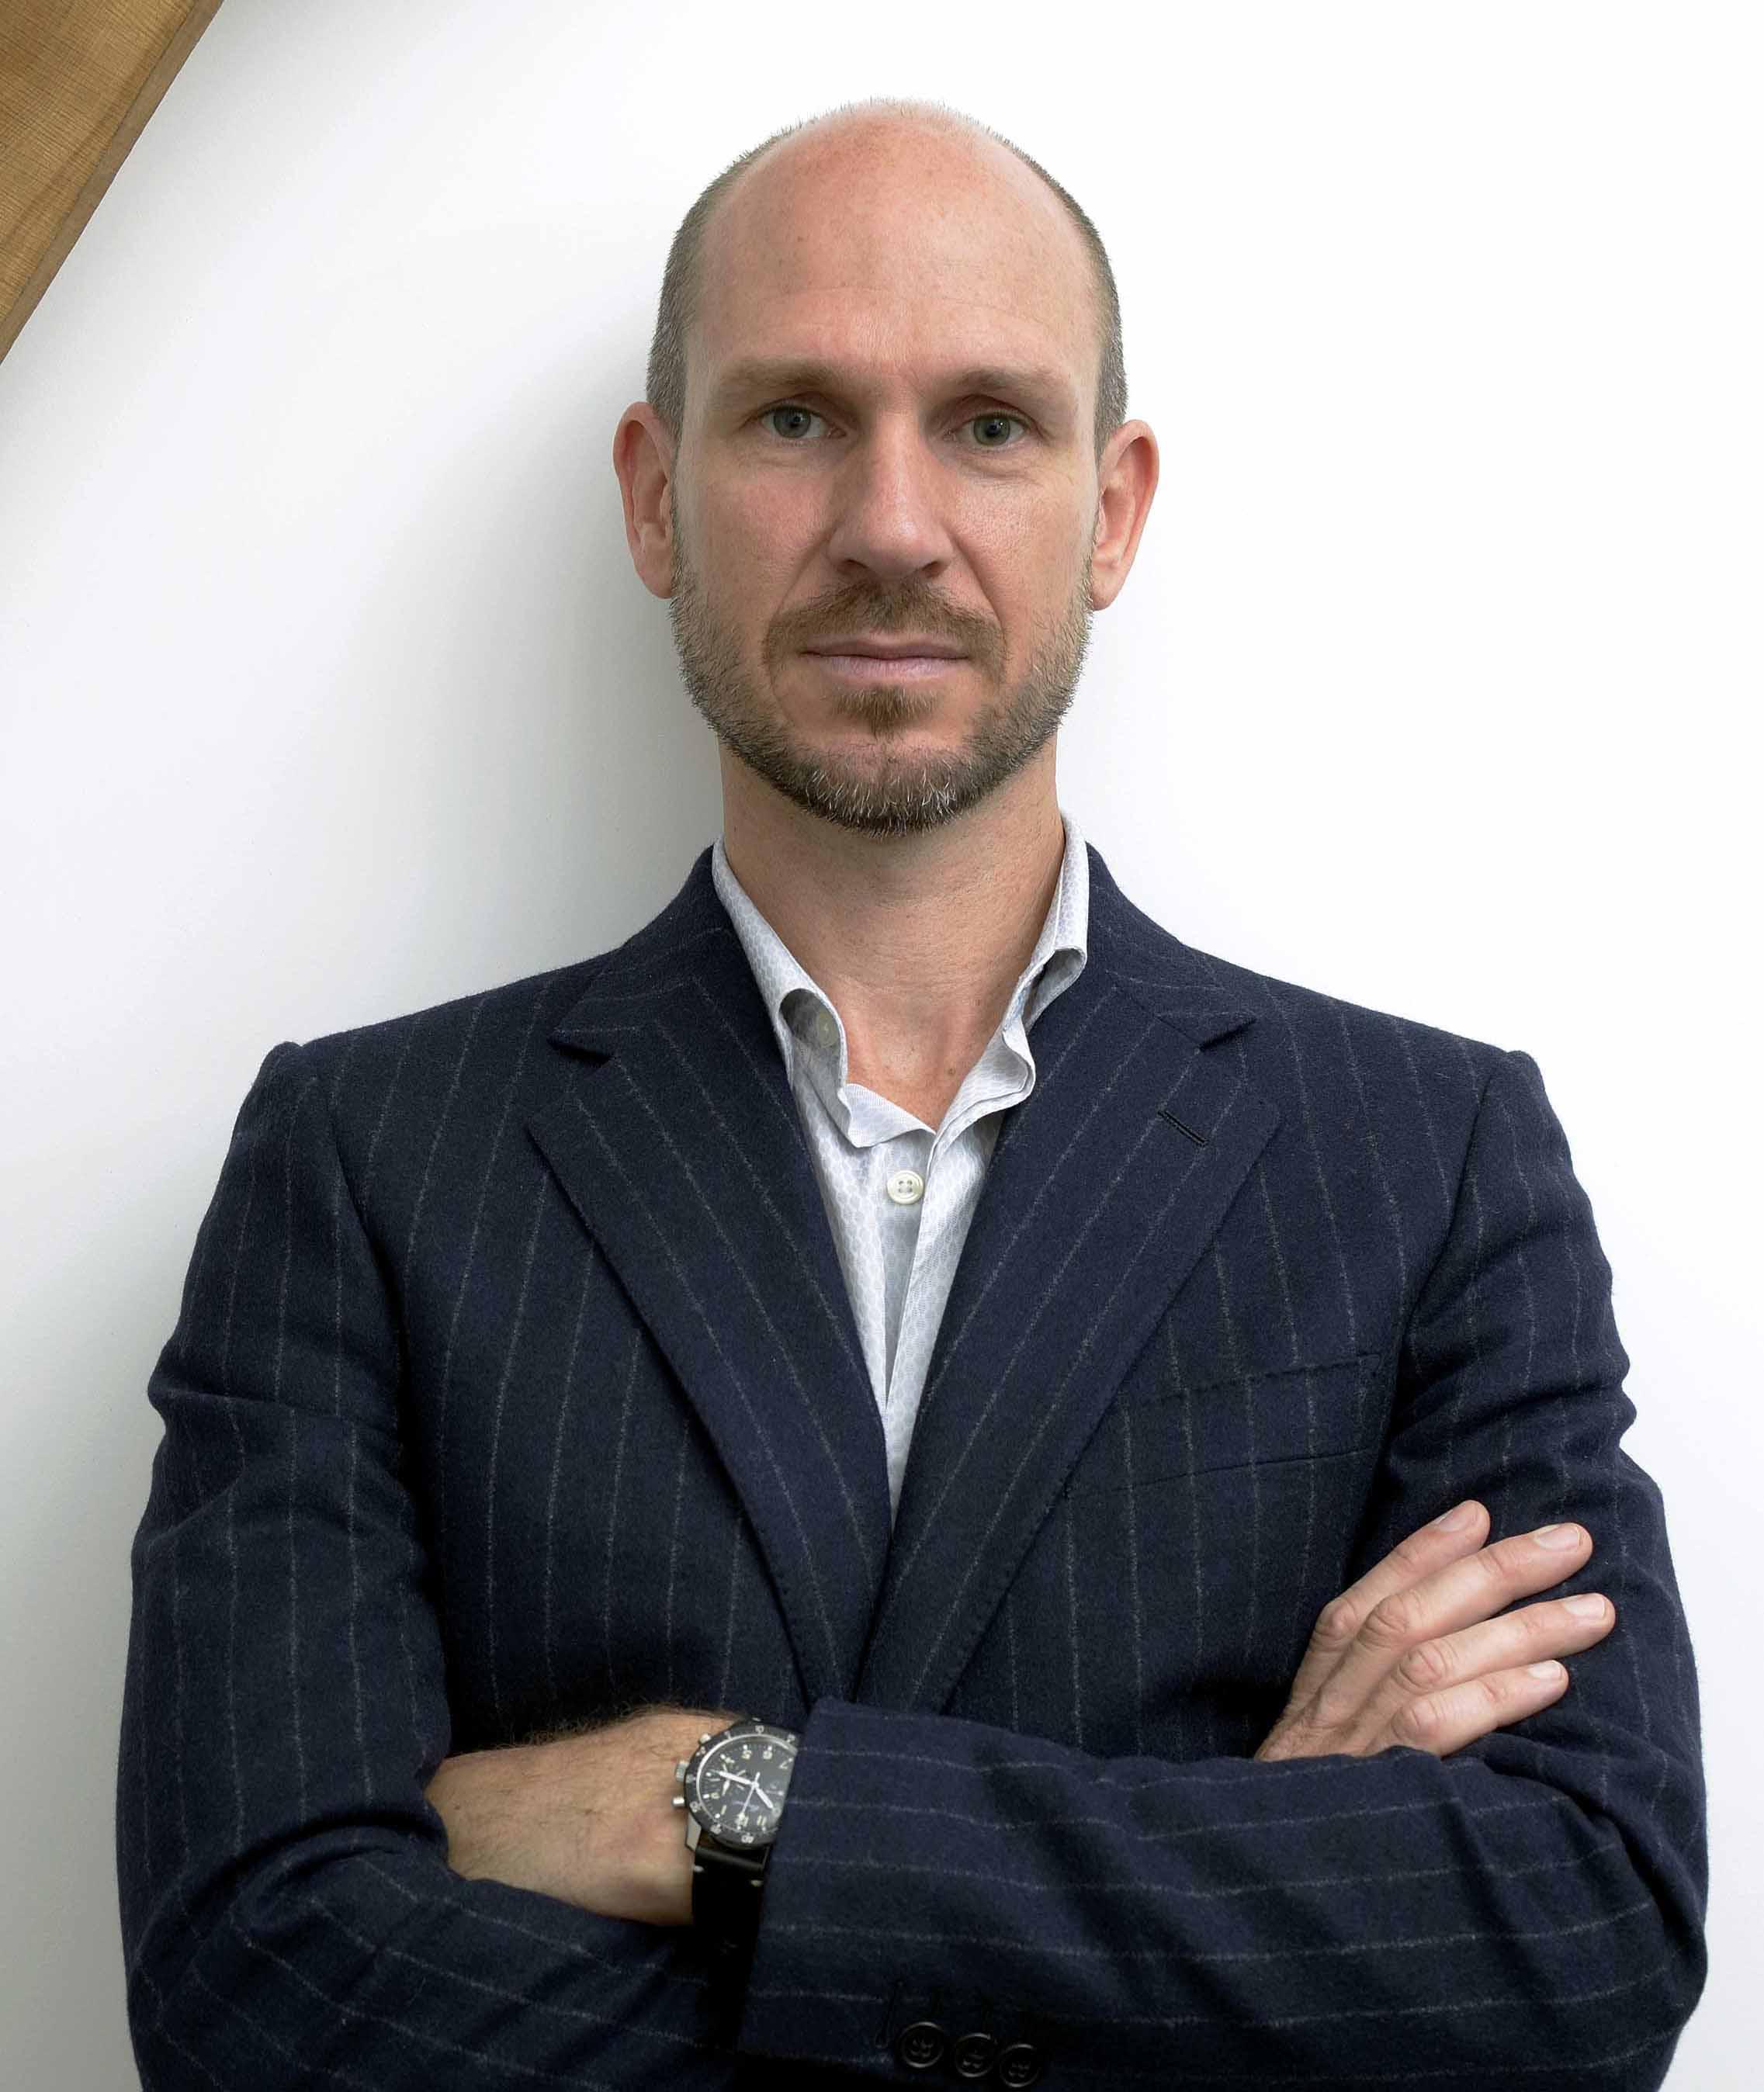 Tristan Auer The Designer of the Year at Maison et Objet 2017 1